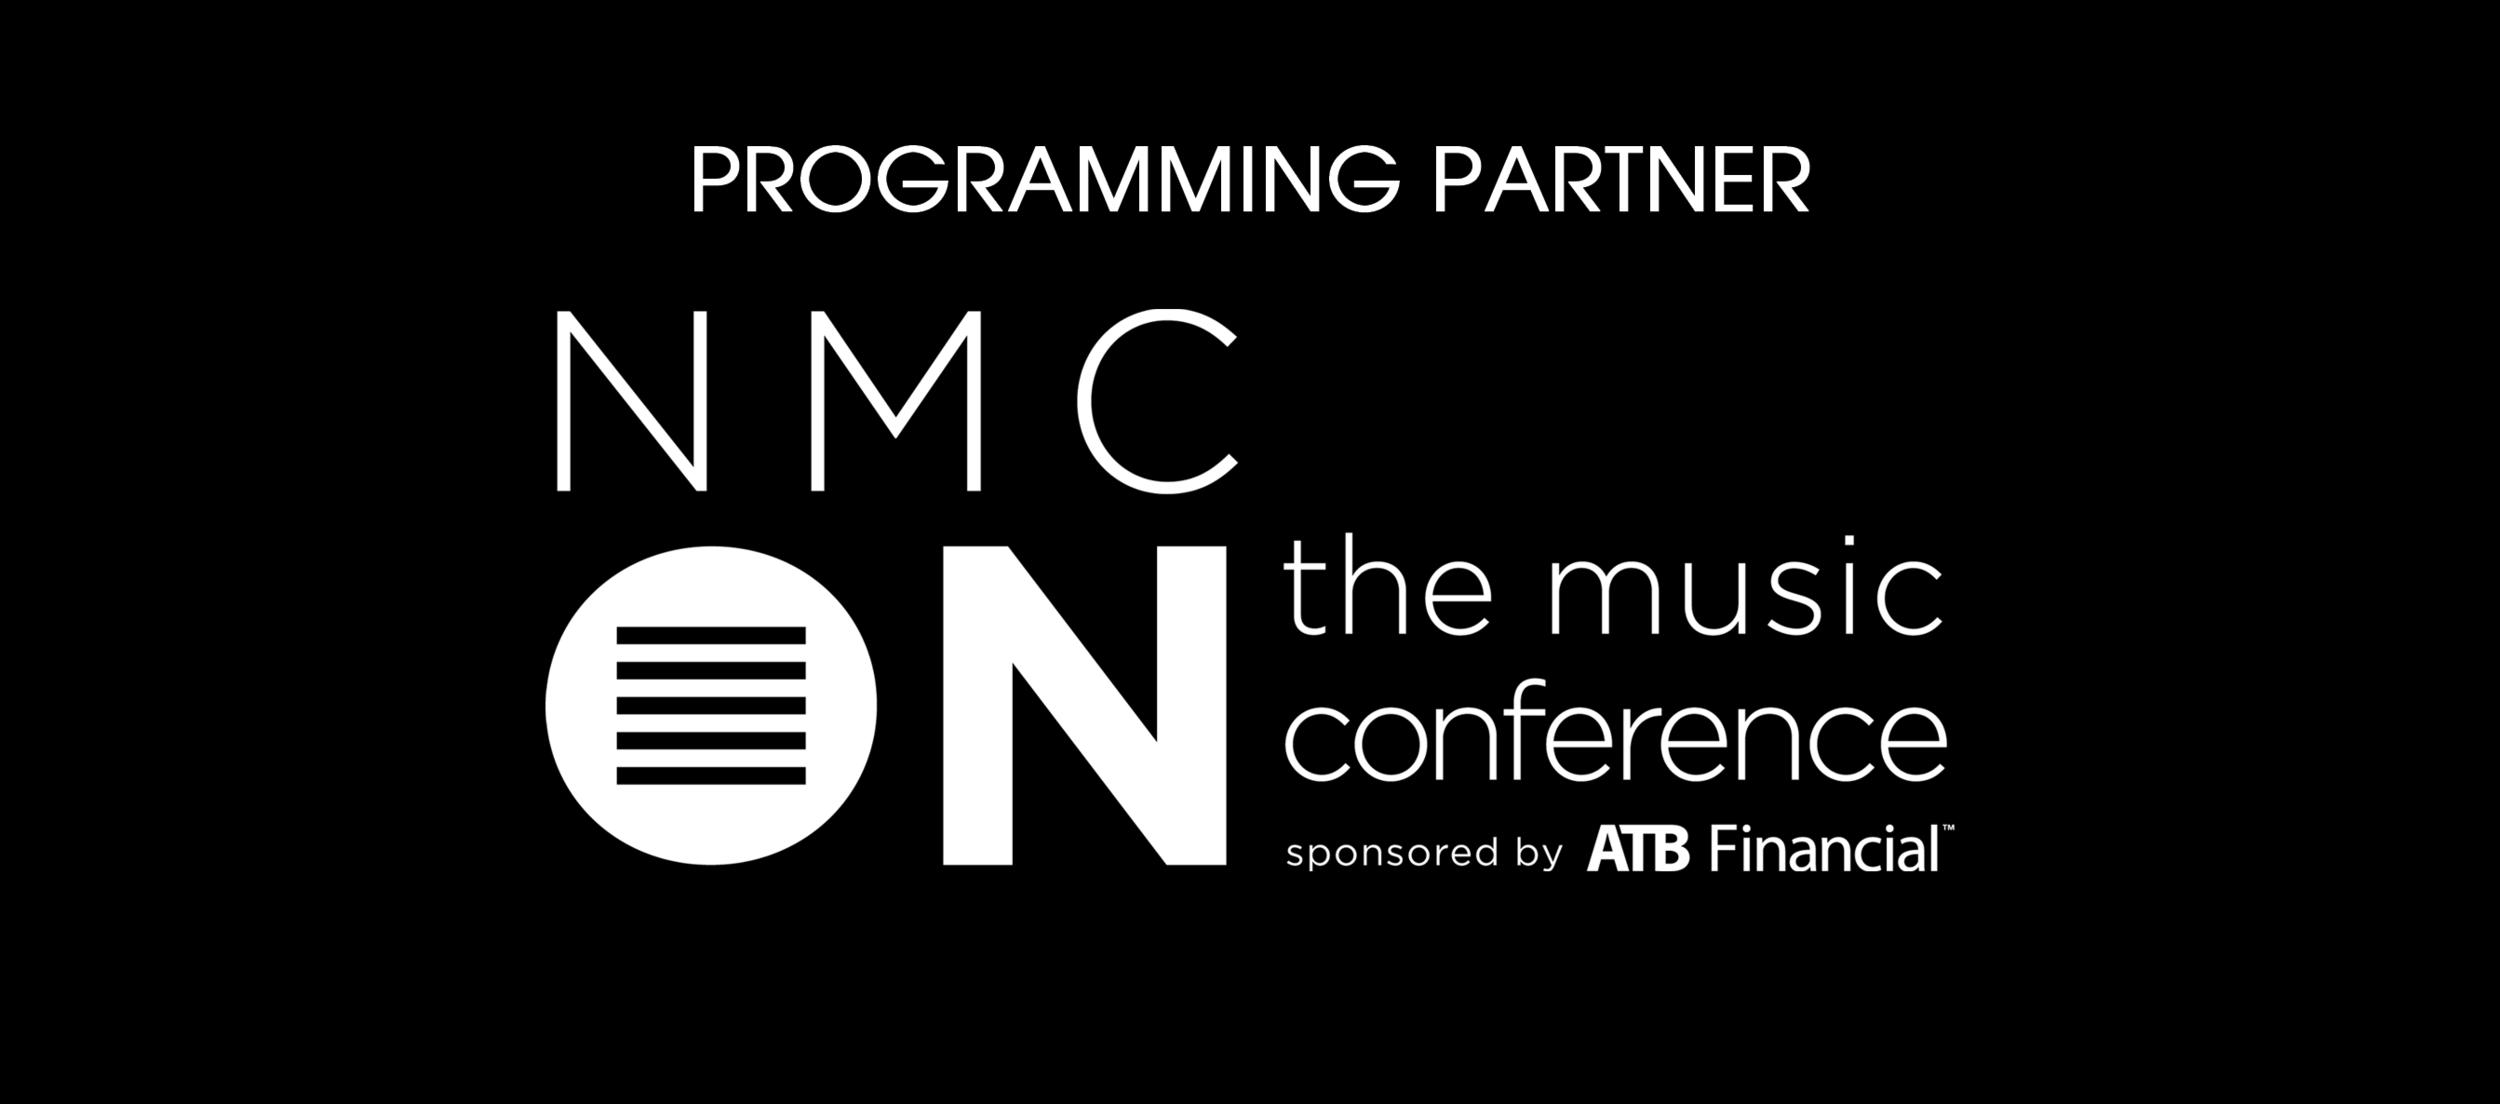 NMCon_H_Black - Programming Partner.png